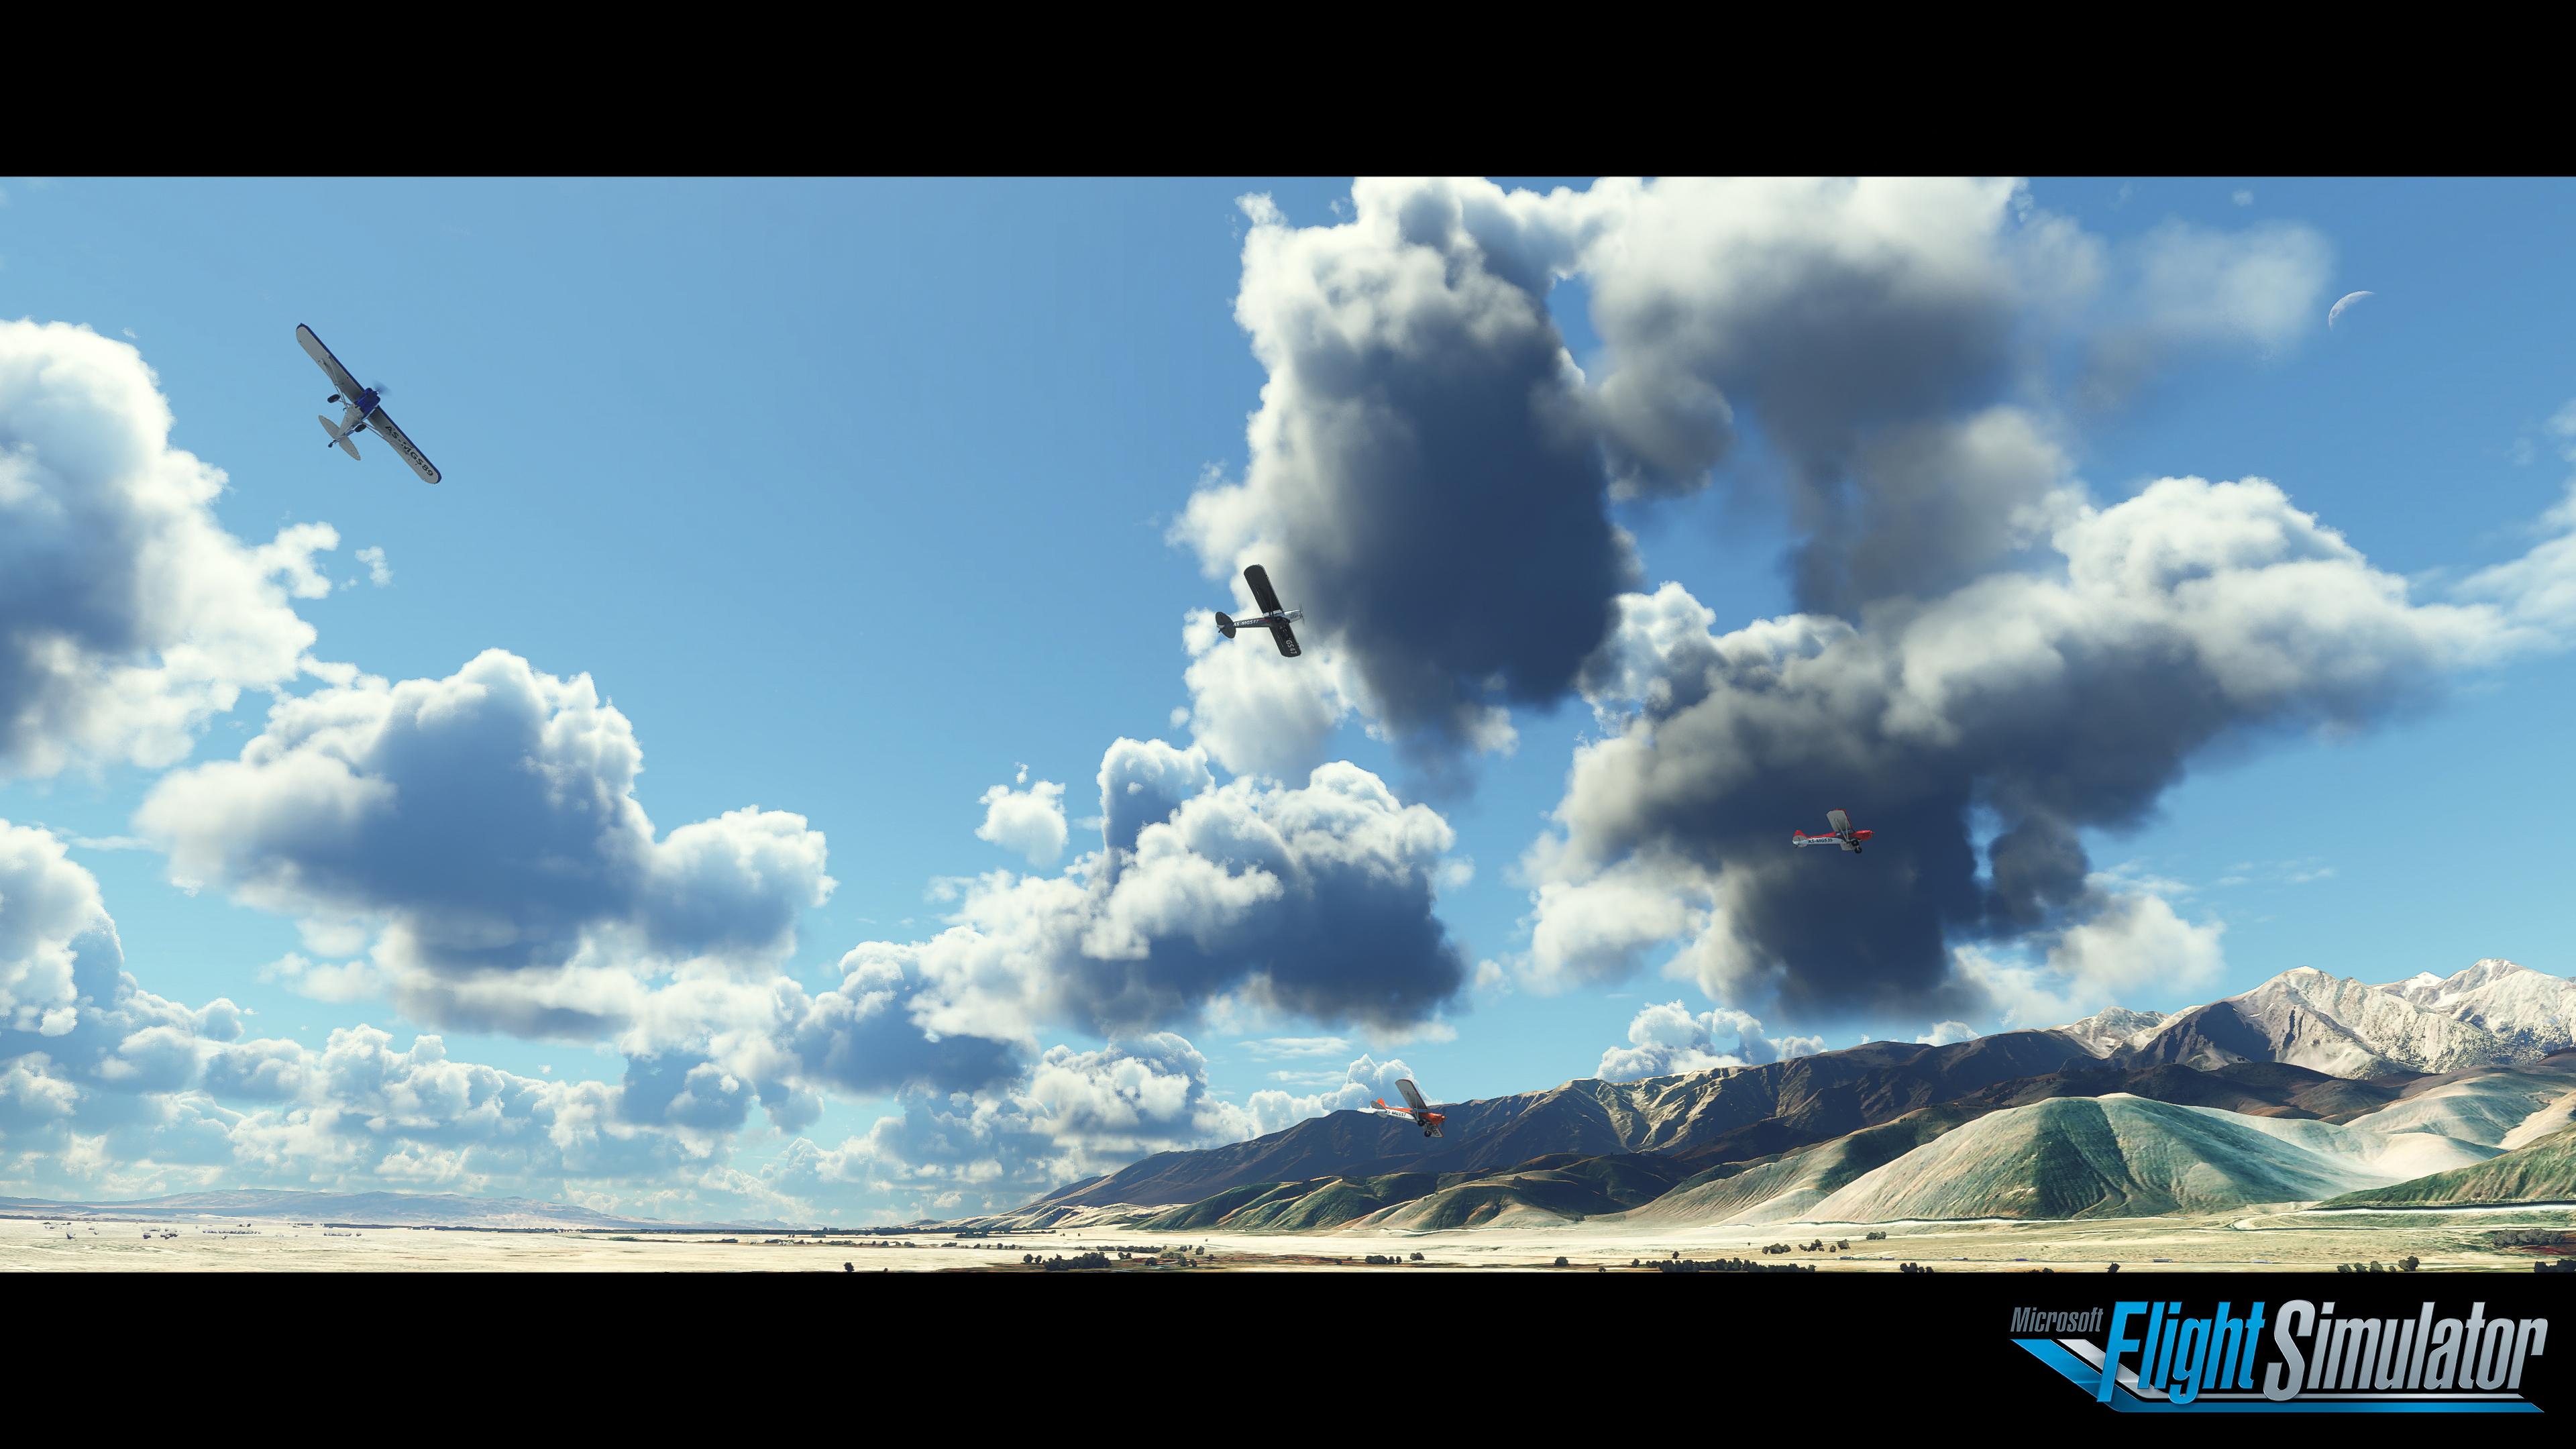 FSI – Microsoft Flight Simulator – new sim announced • C